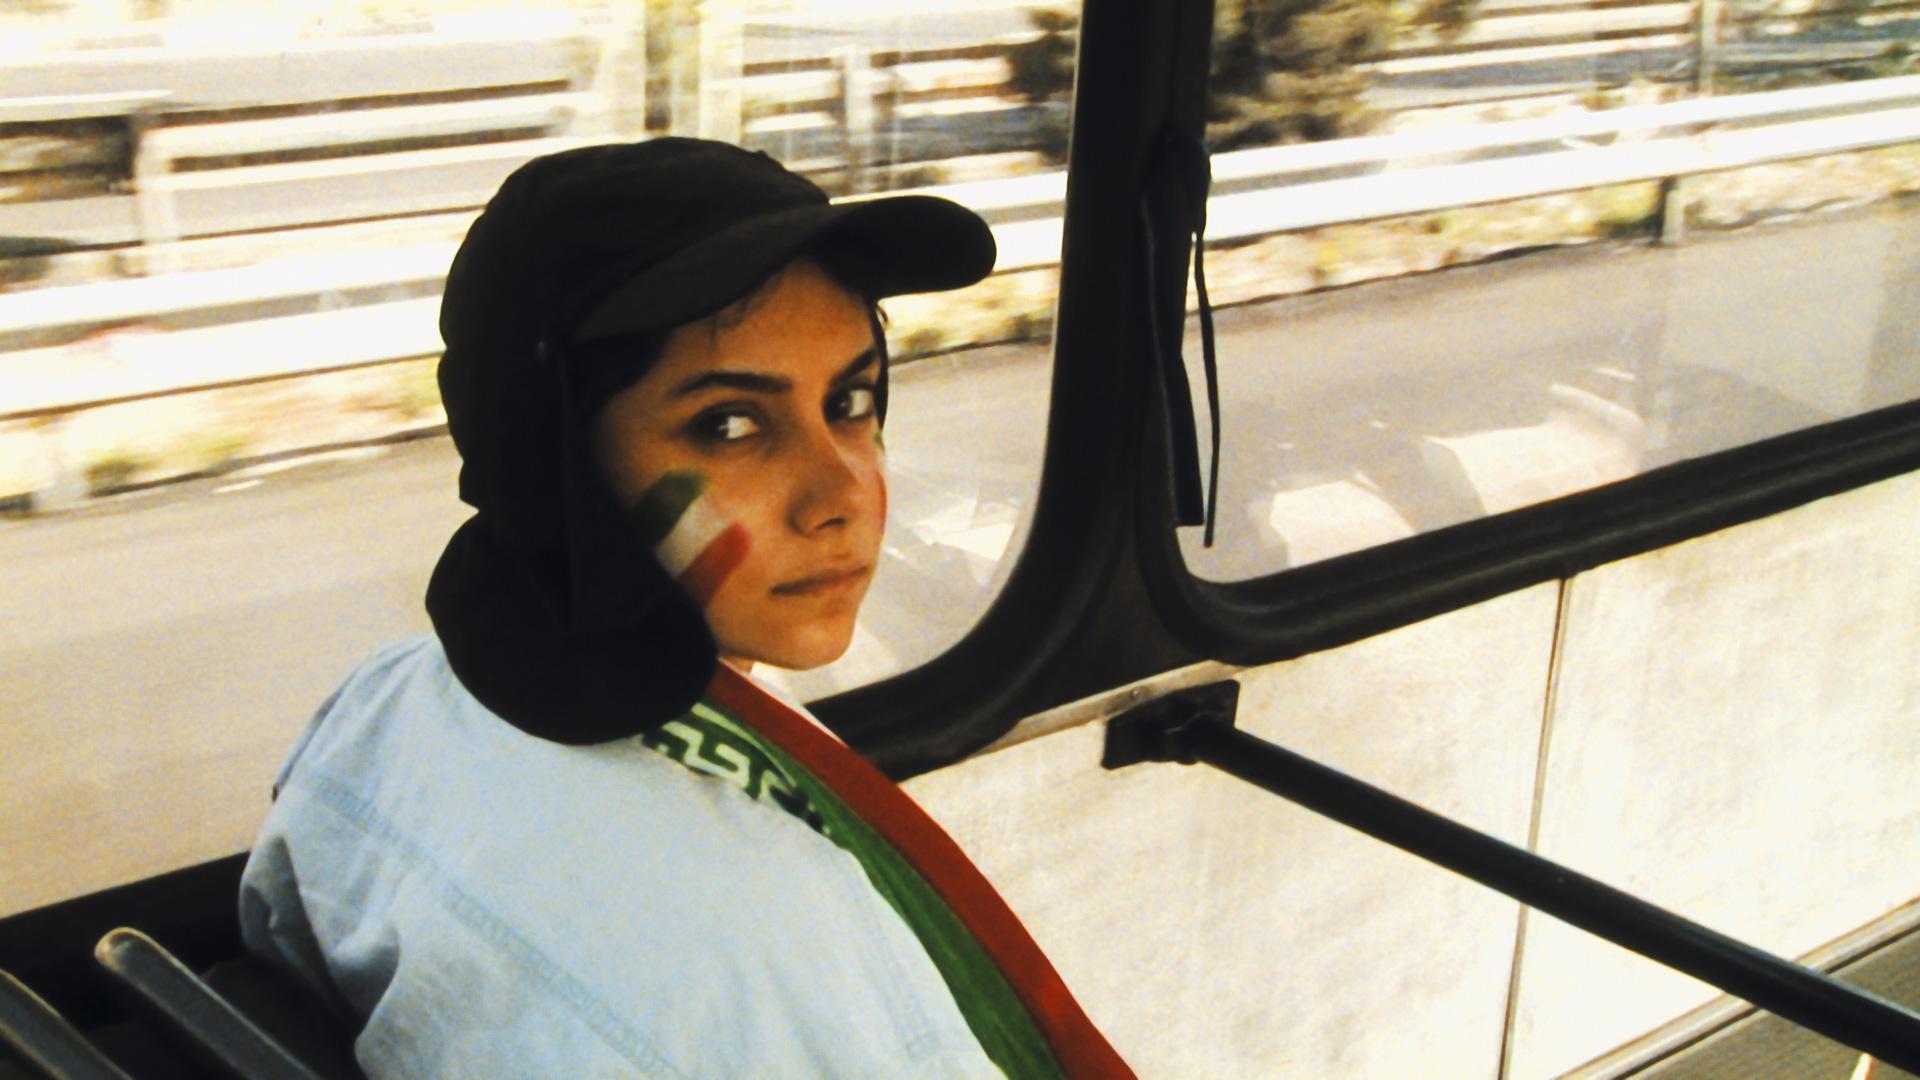 Review: Jafar Panahi's Offside